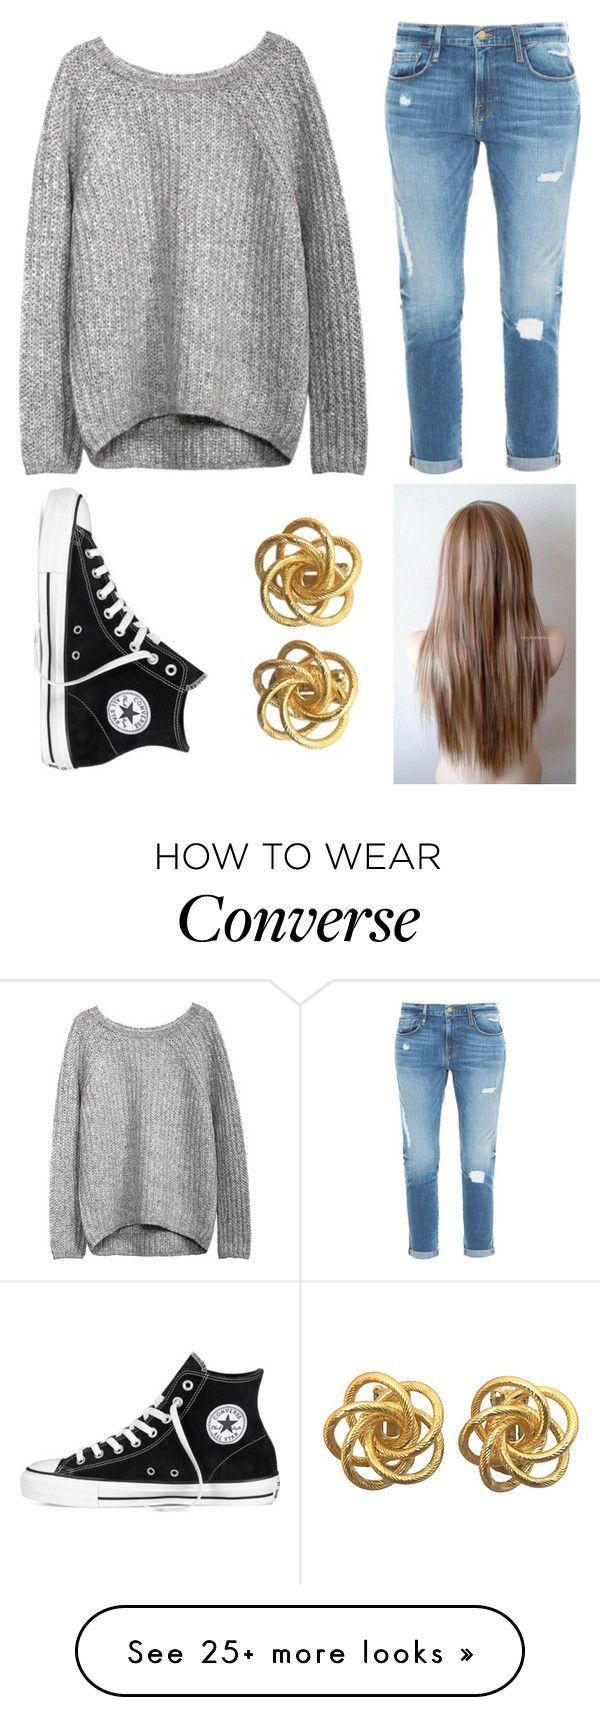 Converse Sets